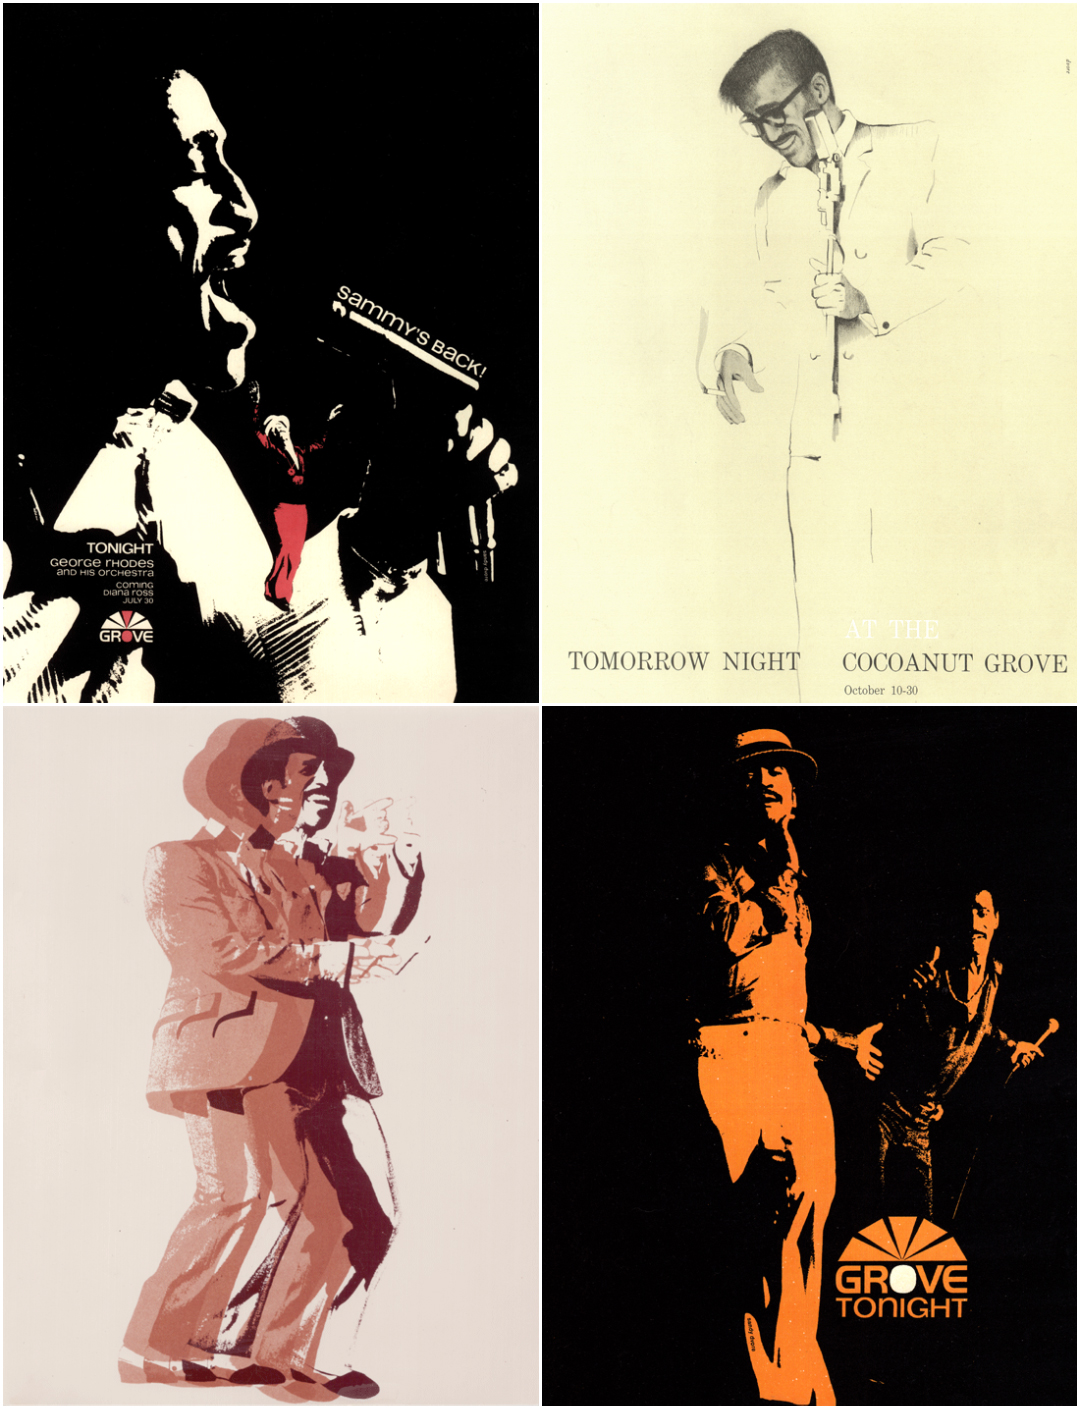 IMAGE: Sammy Davis Jr ads - 4 up